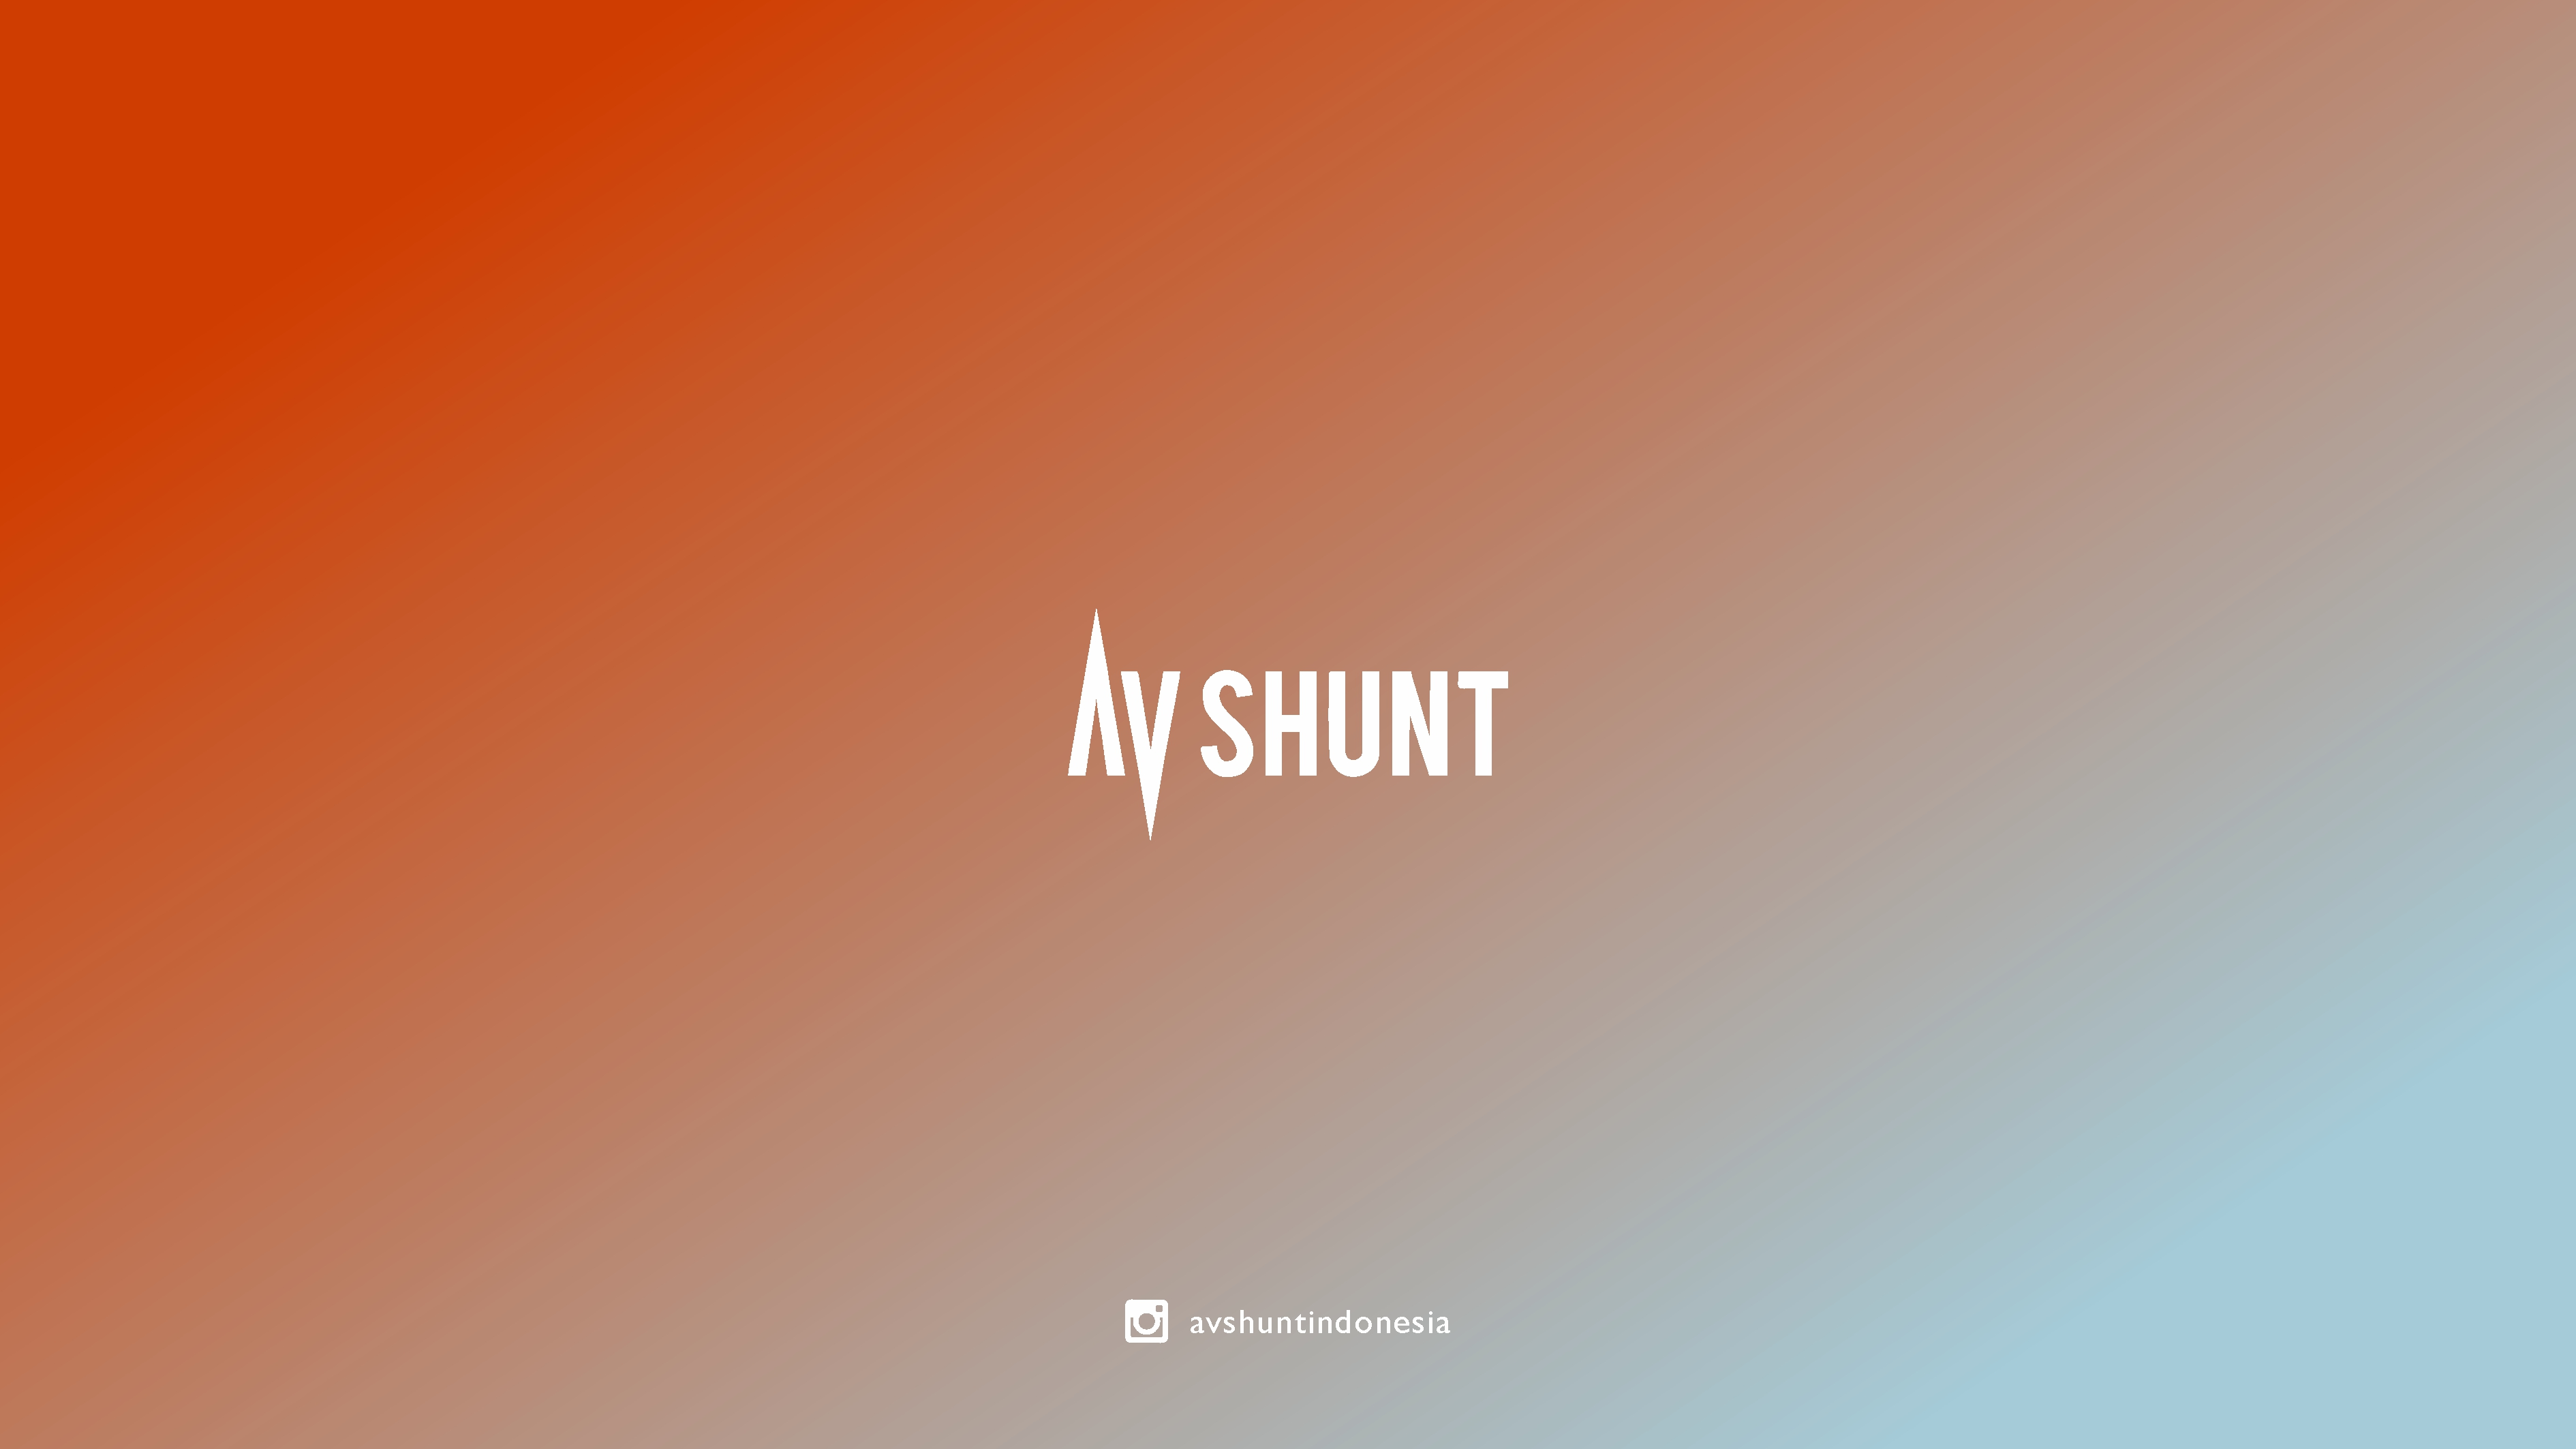 http://avshuntindonesia.com/images/advertisement/ADS__home2__20180211072920.jpg